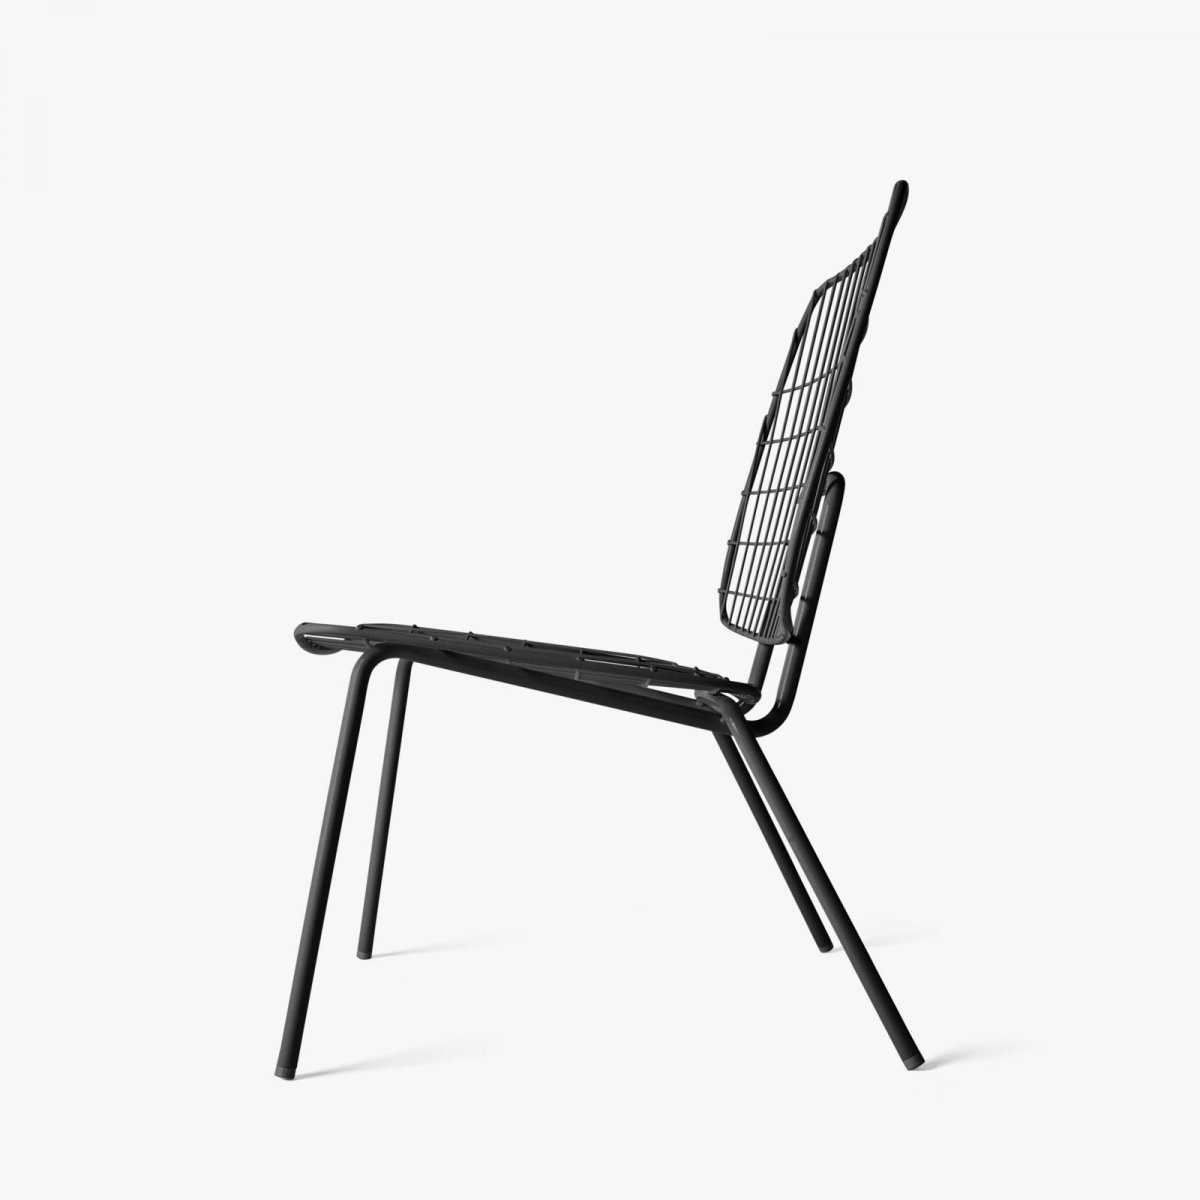 WM String Lounge Chair, black, side view.